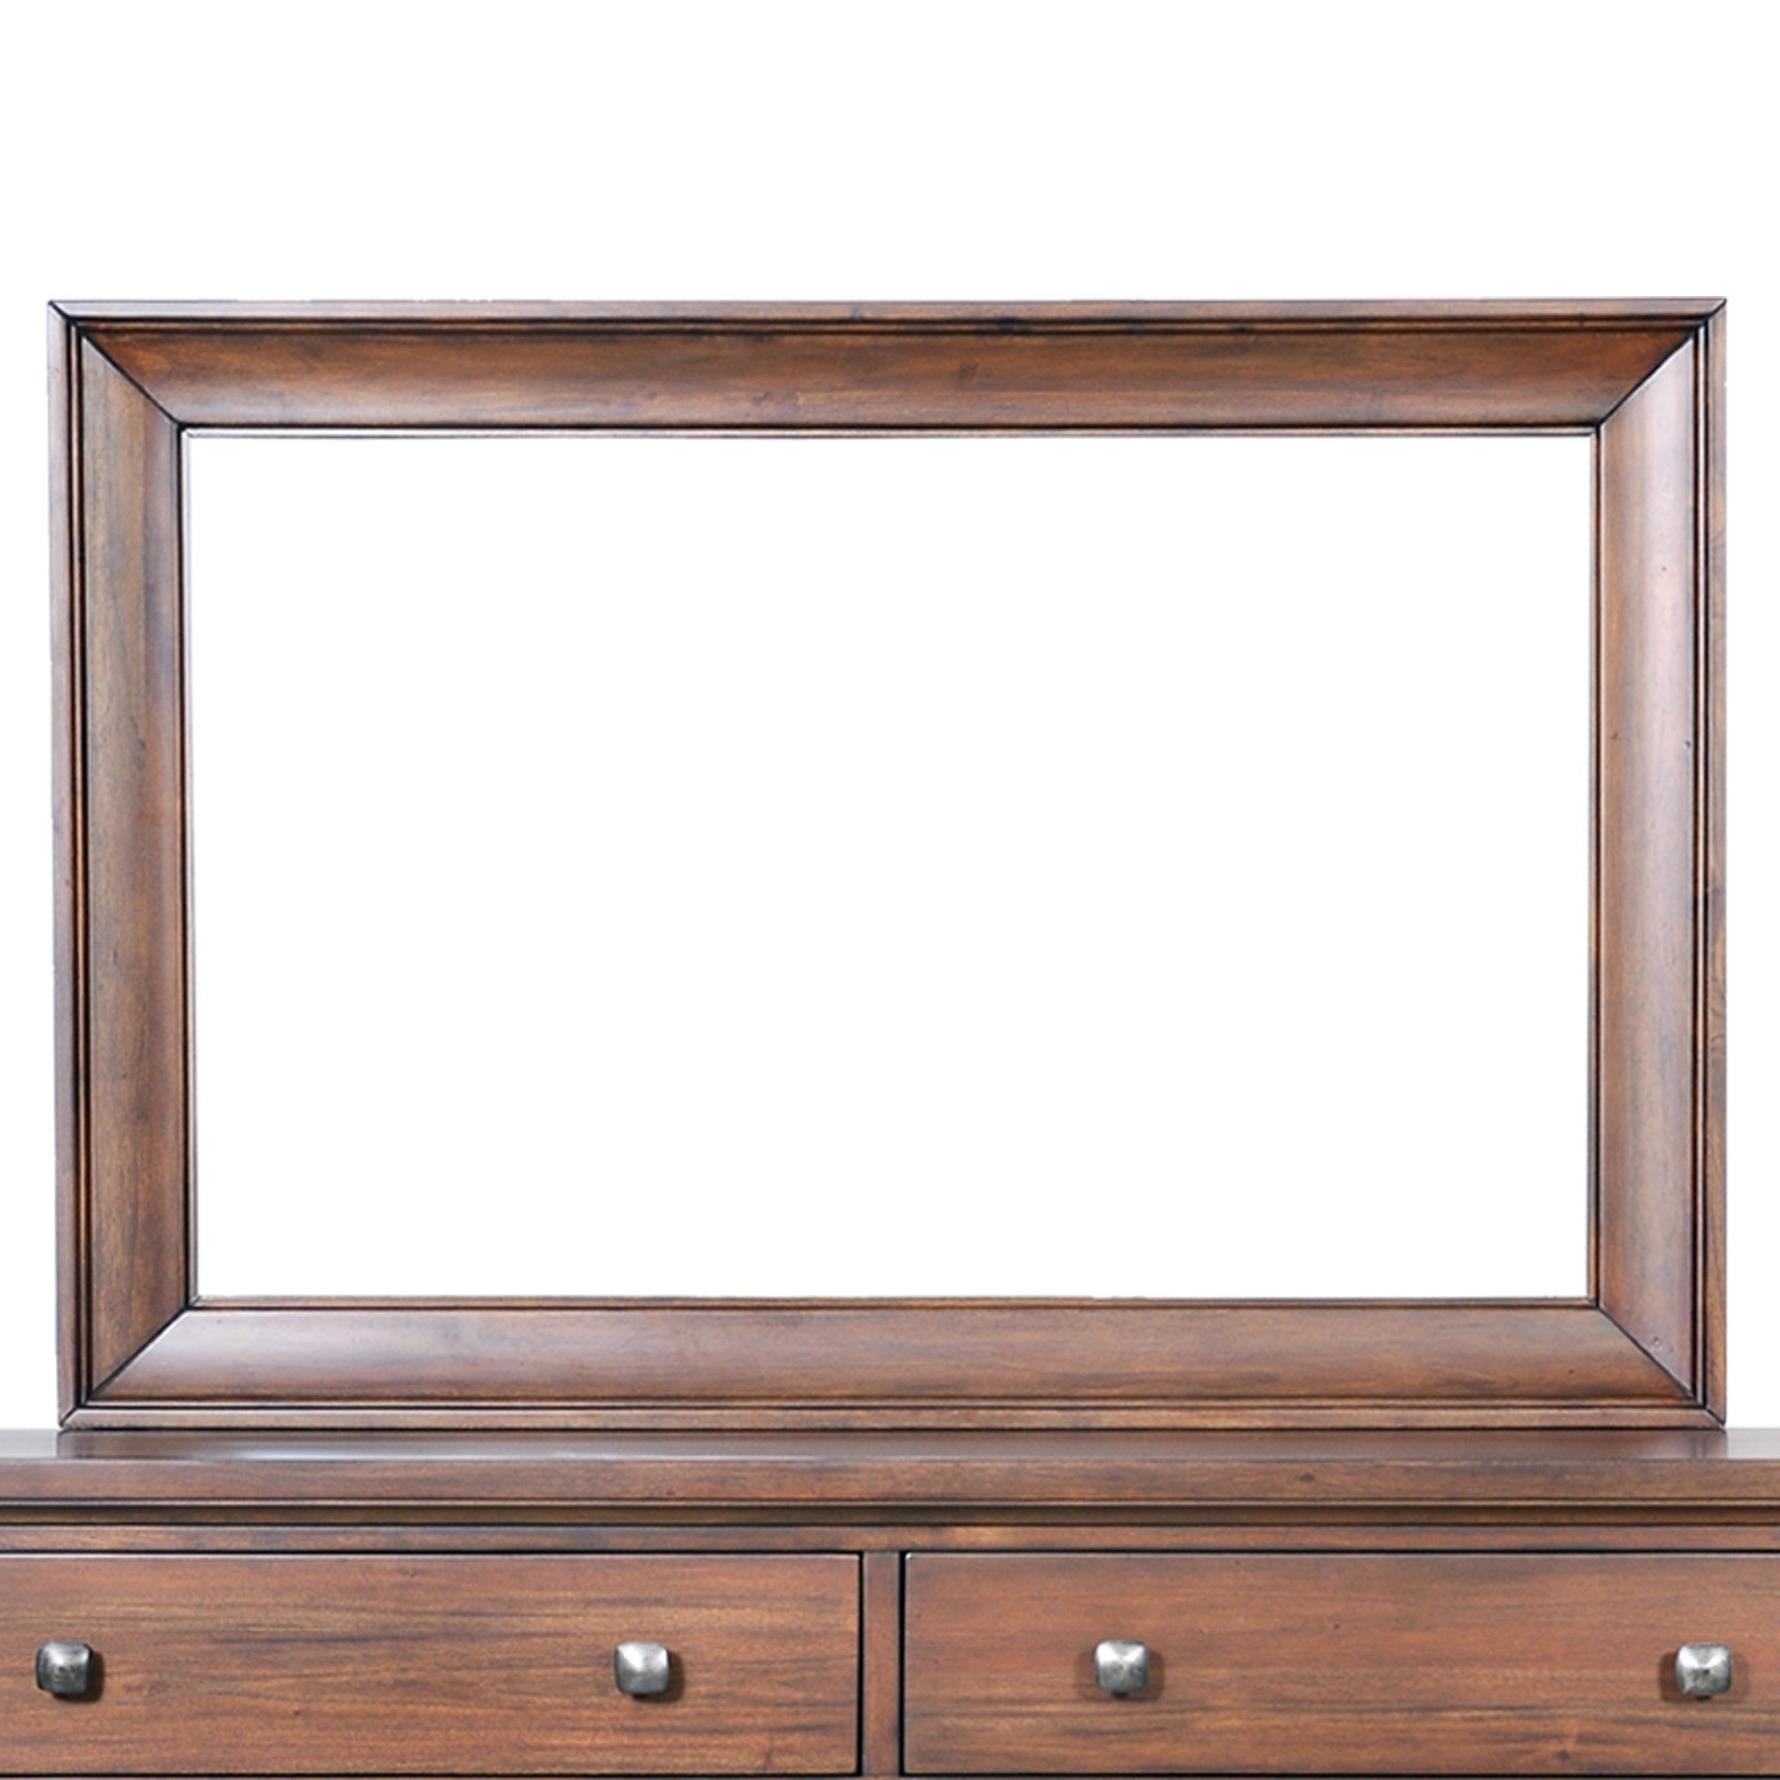 Coronado Mirror by Harris Furniture at Powell's Furniture and Mattress